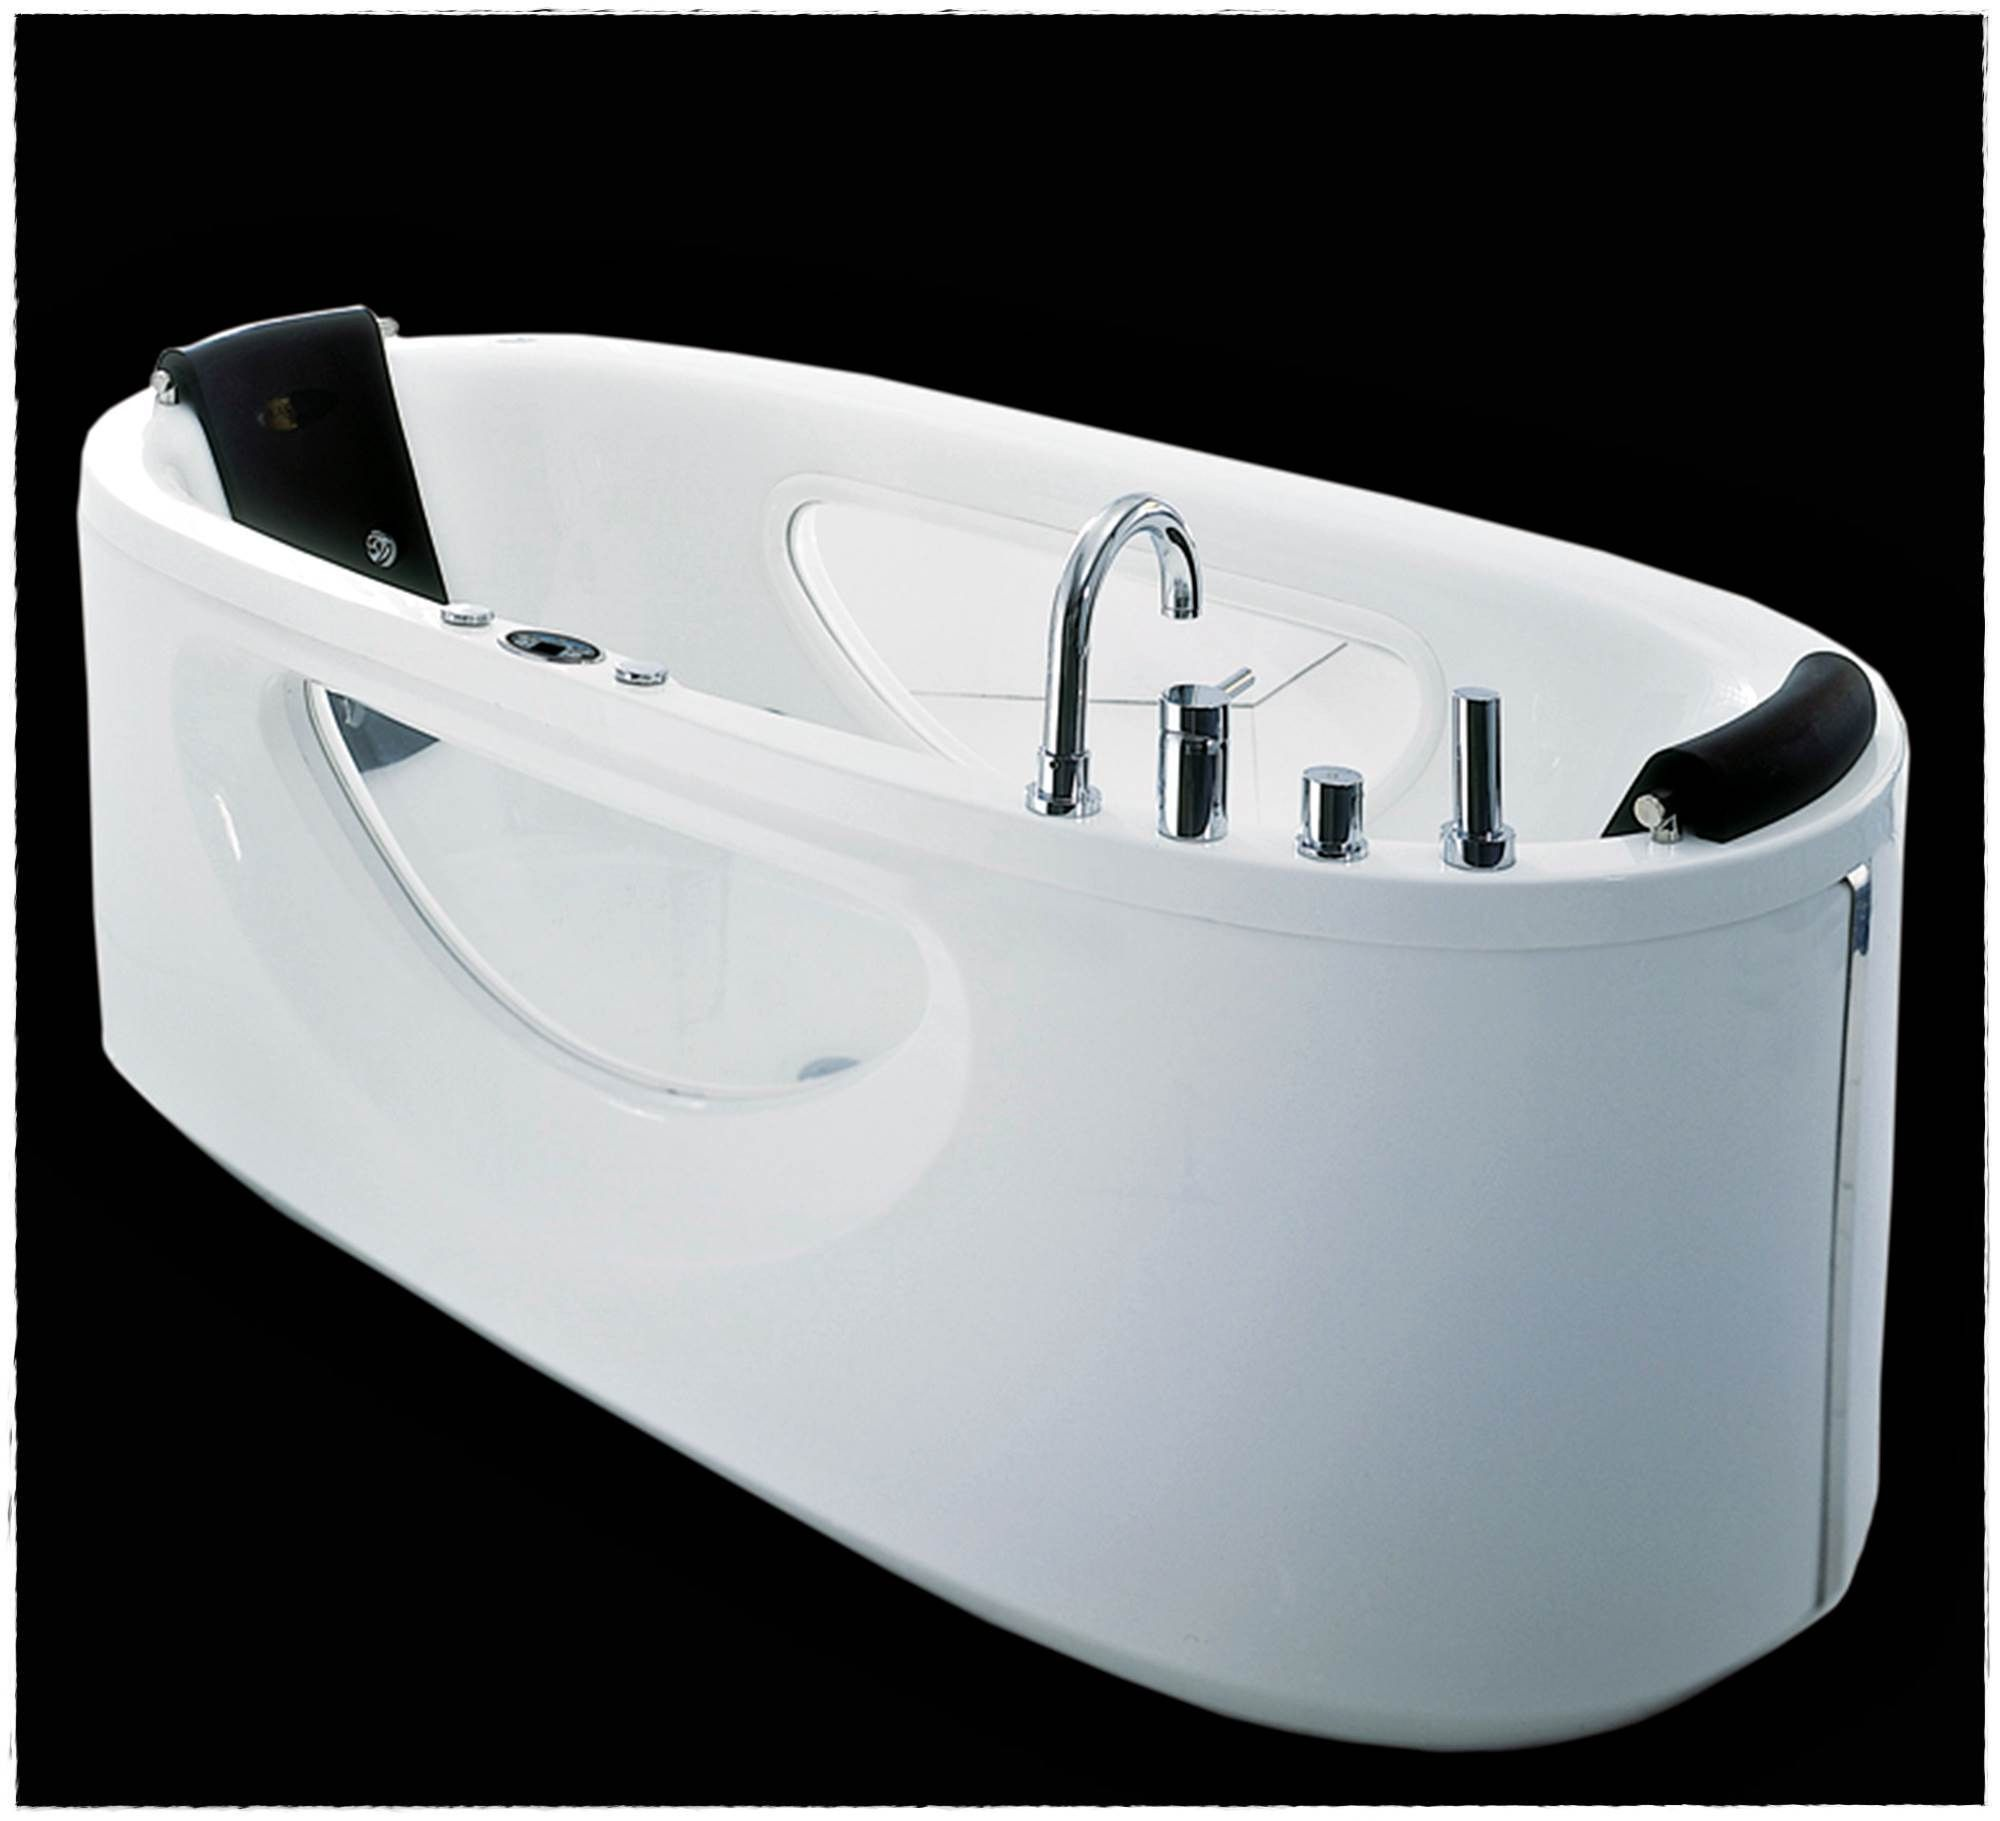 Baignoire Balneo Leroy Merlin Ca Vaut Le Coup De Voler Bathroom